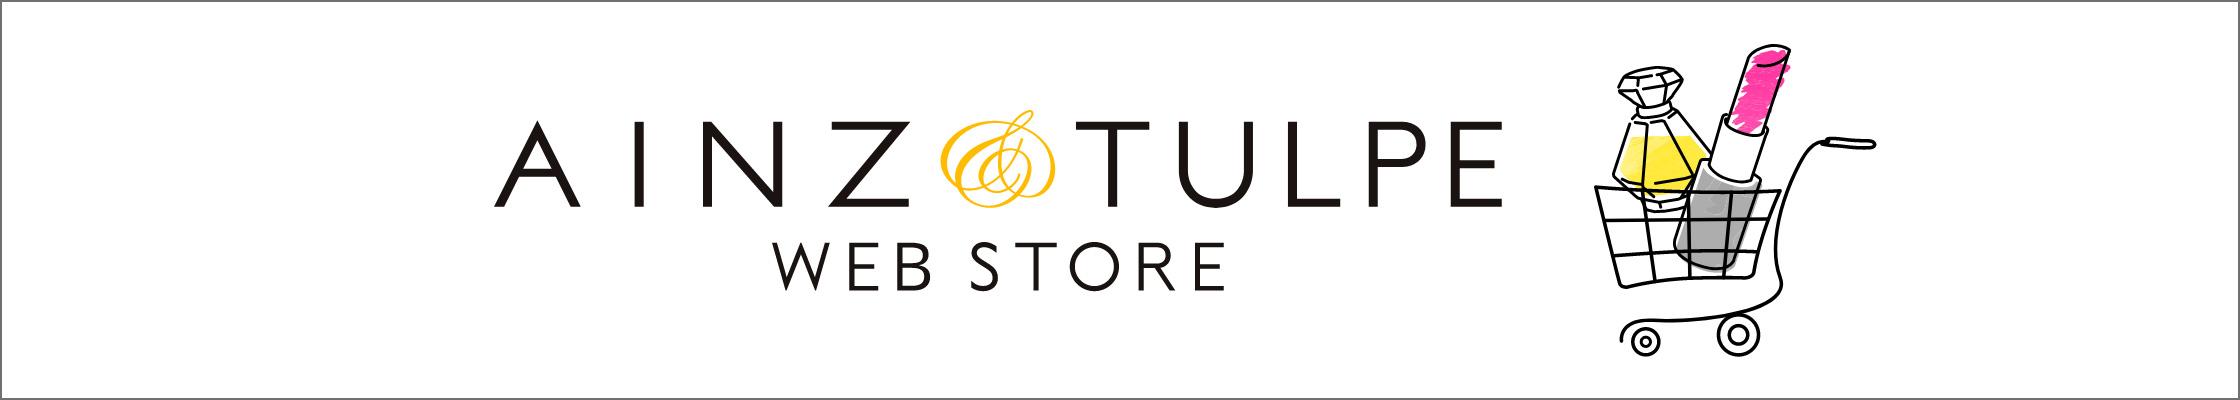 AINZ&TULPE WEBSTORE - アインズ&トルペ公式オンライン通販サイト